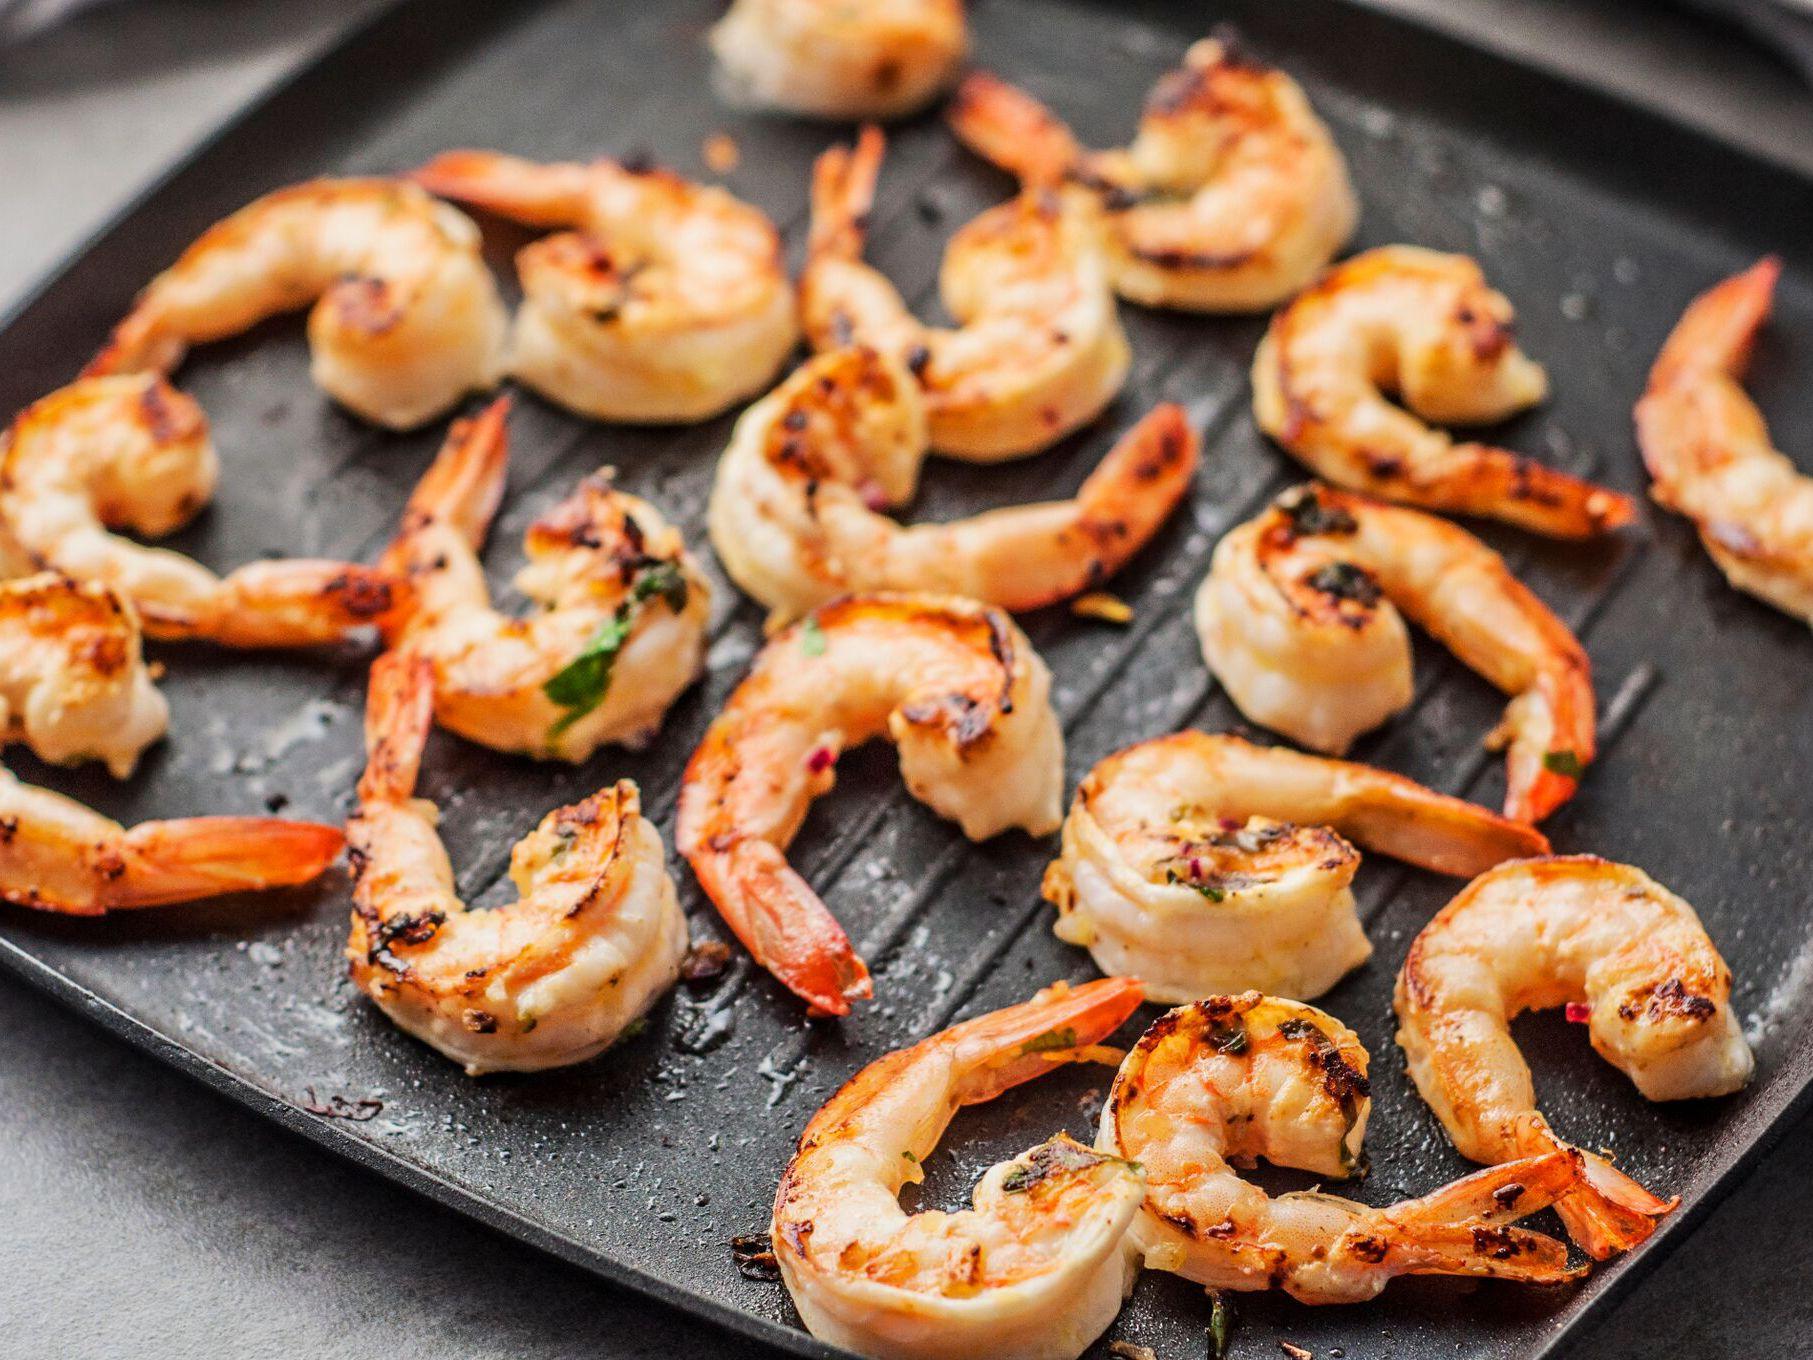 Grilled Jumbo Shrimp With Lemon Herb Marinade